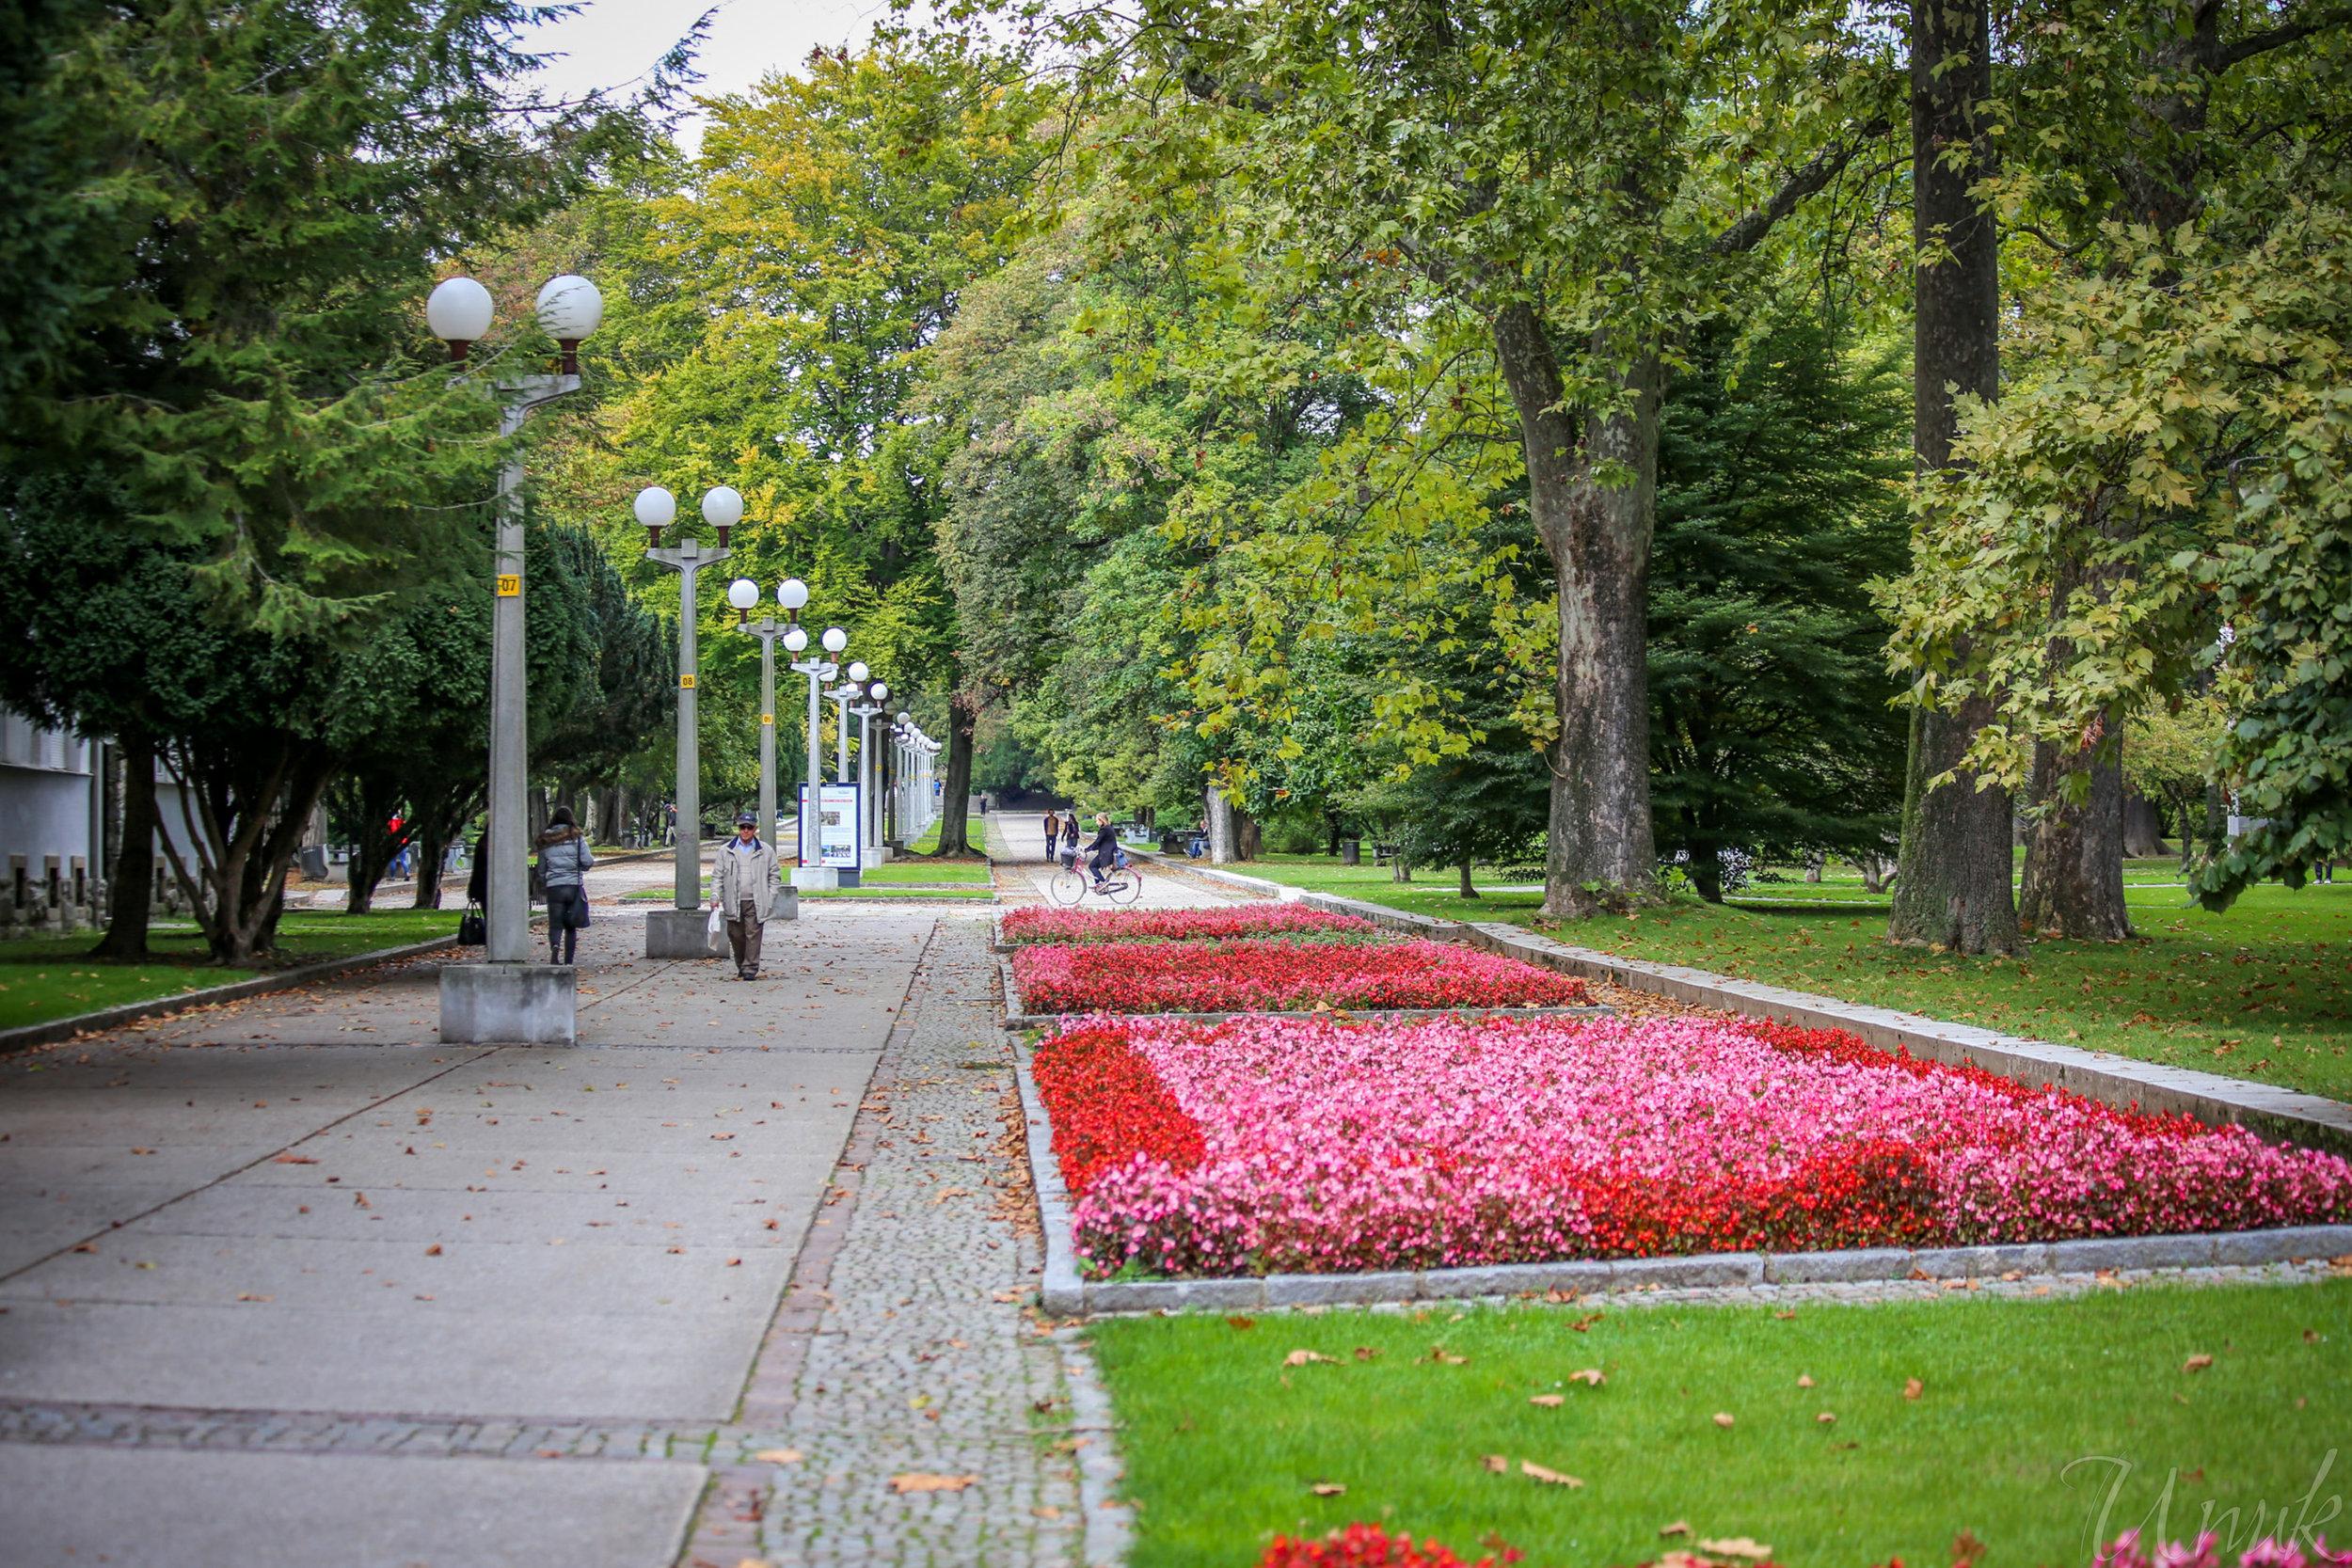 Foto: Igor Unuk - City Park